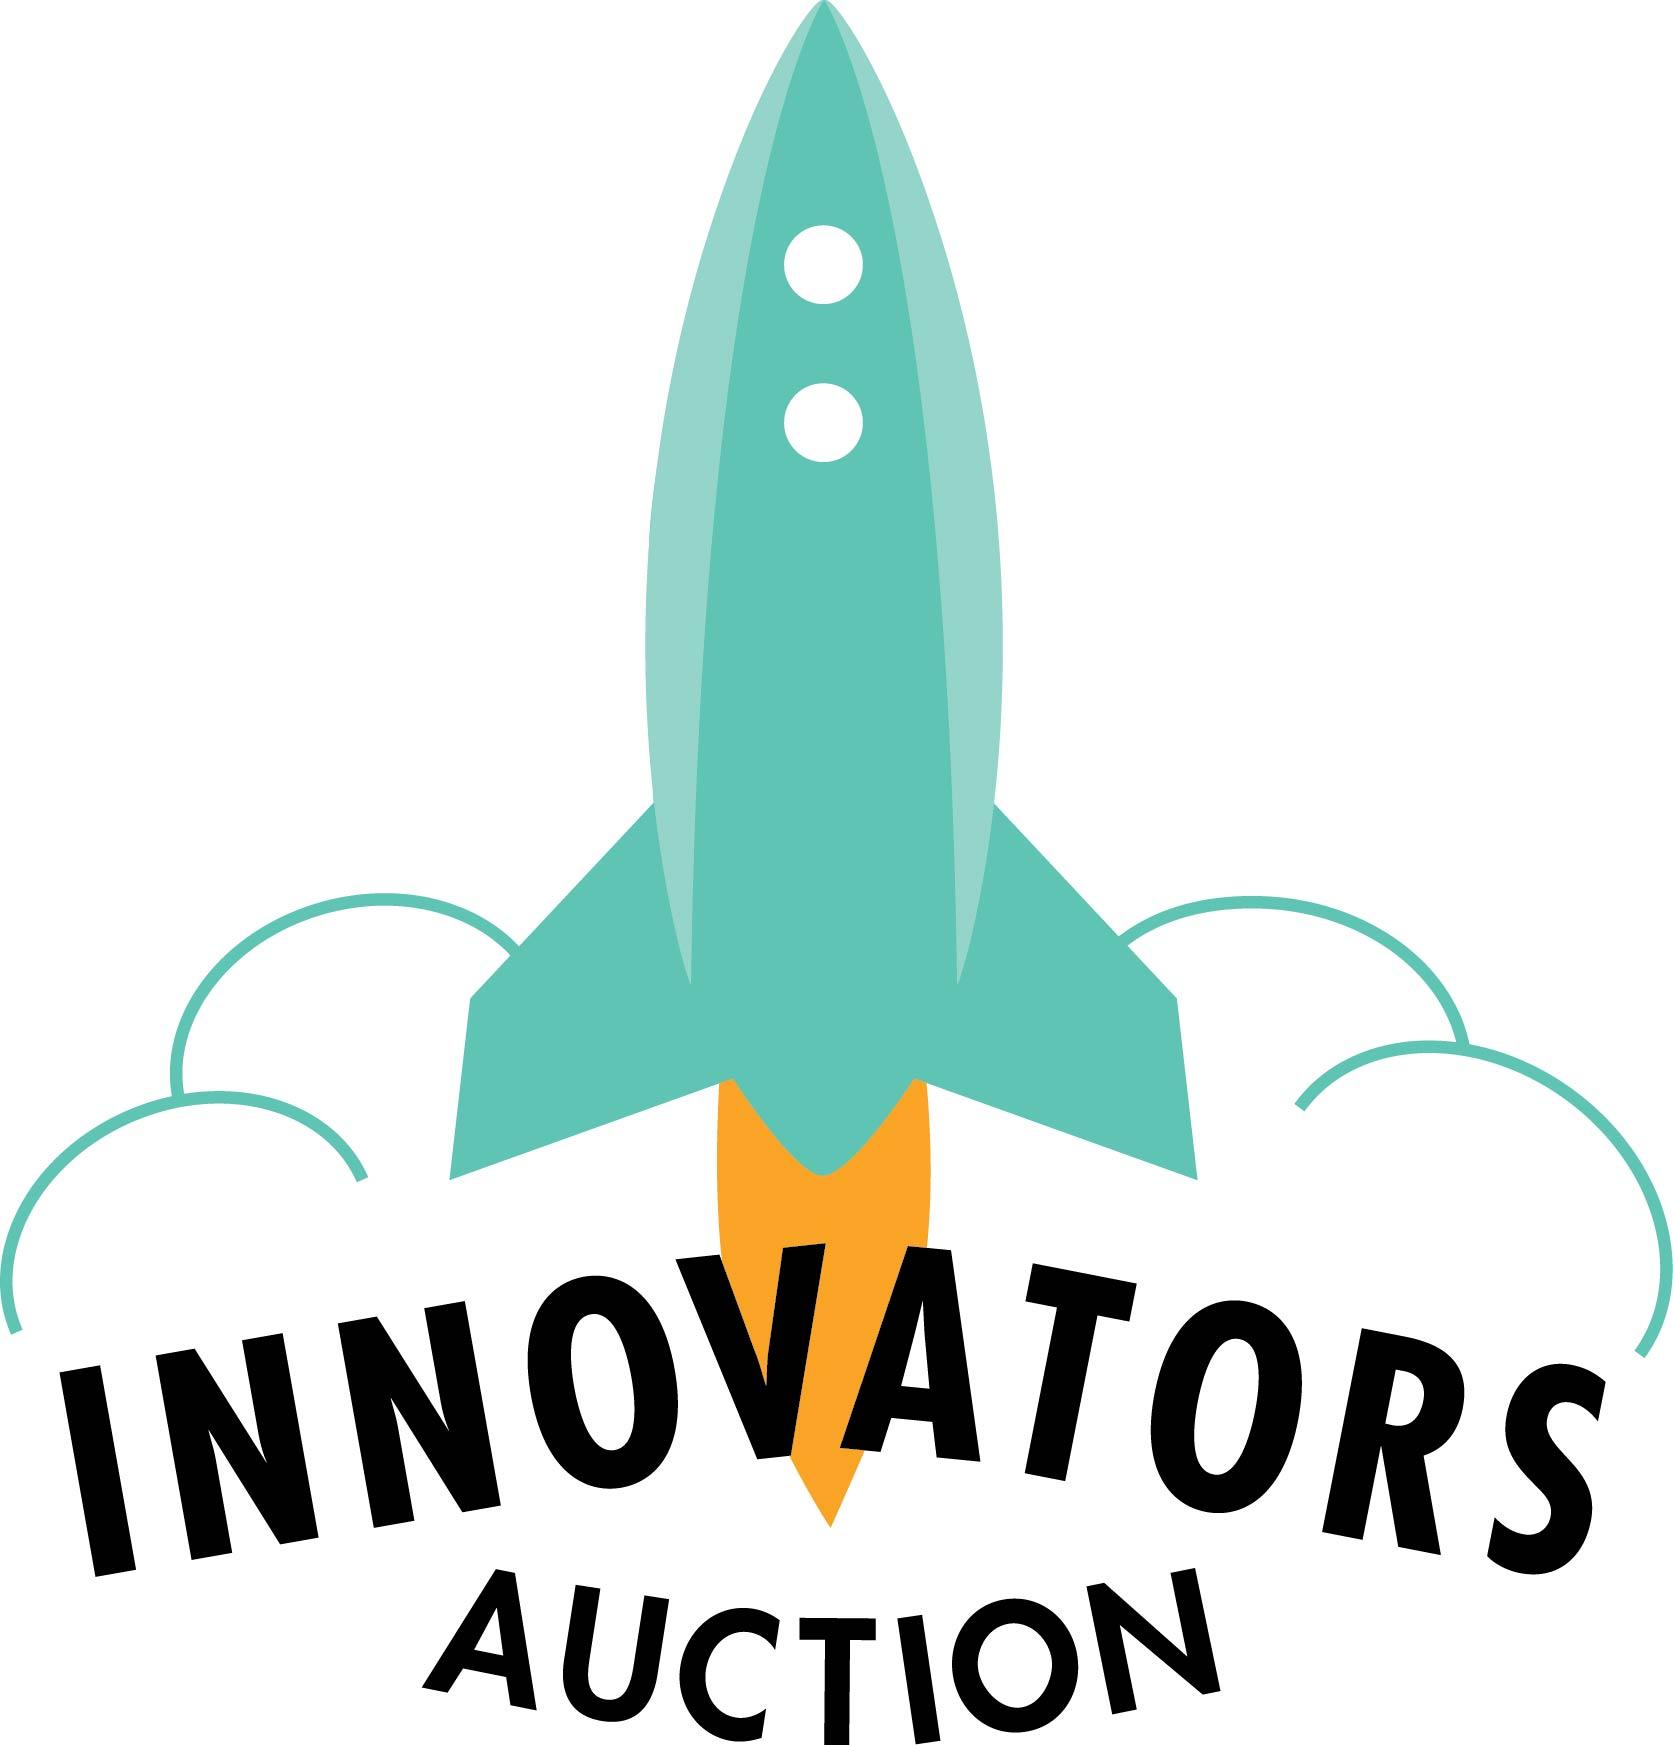 innovators_auction_logo_FINAL.jpg